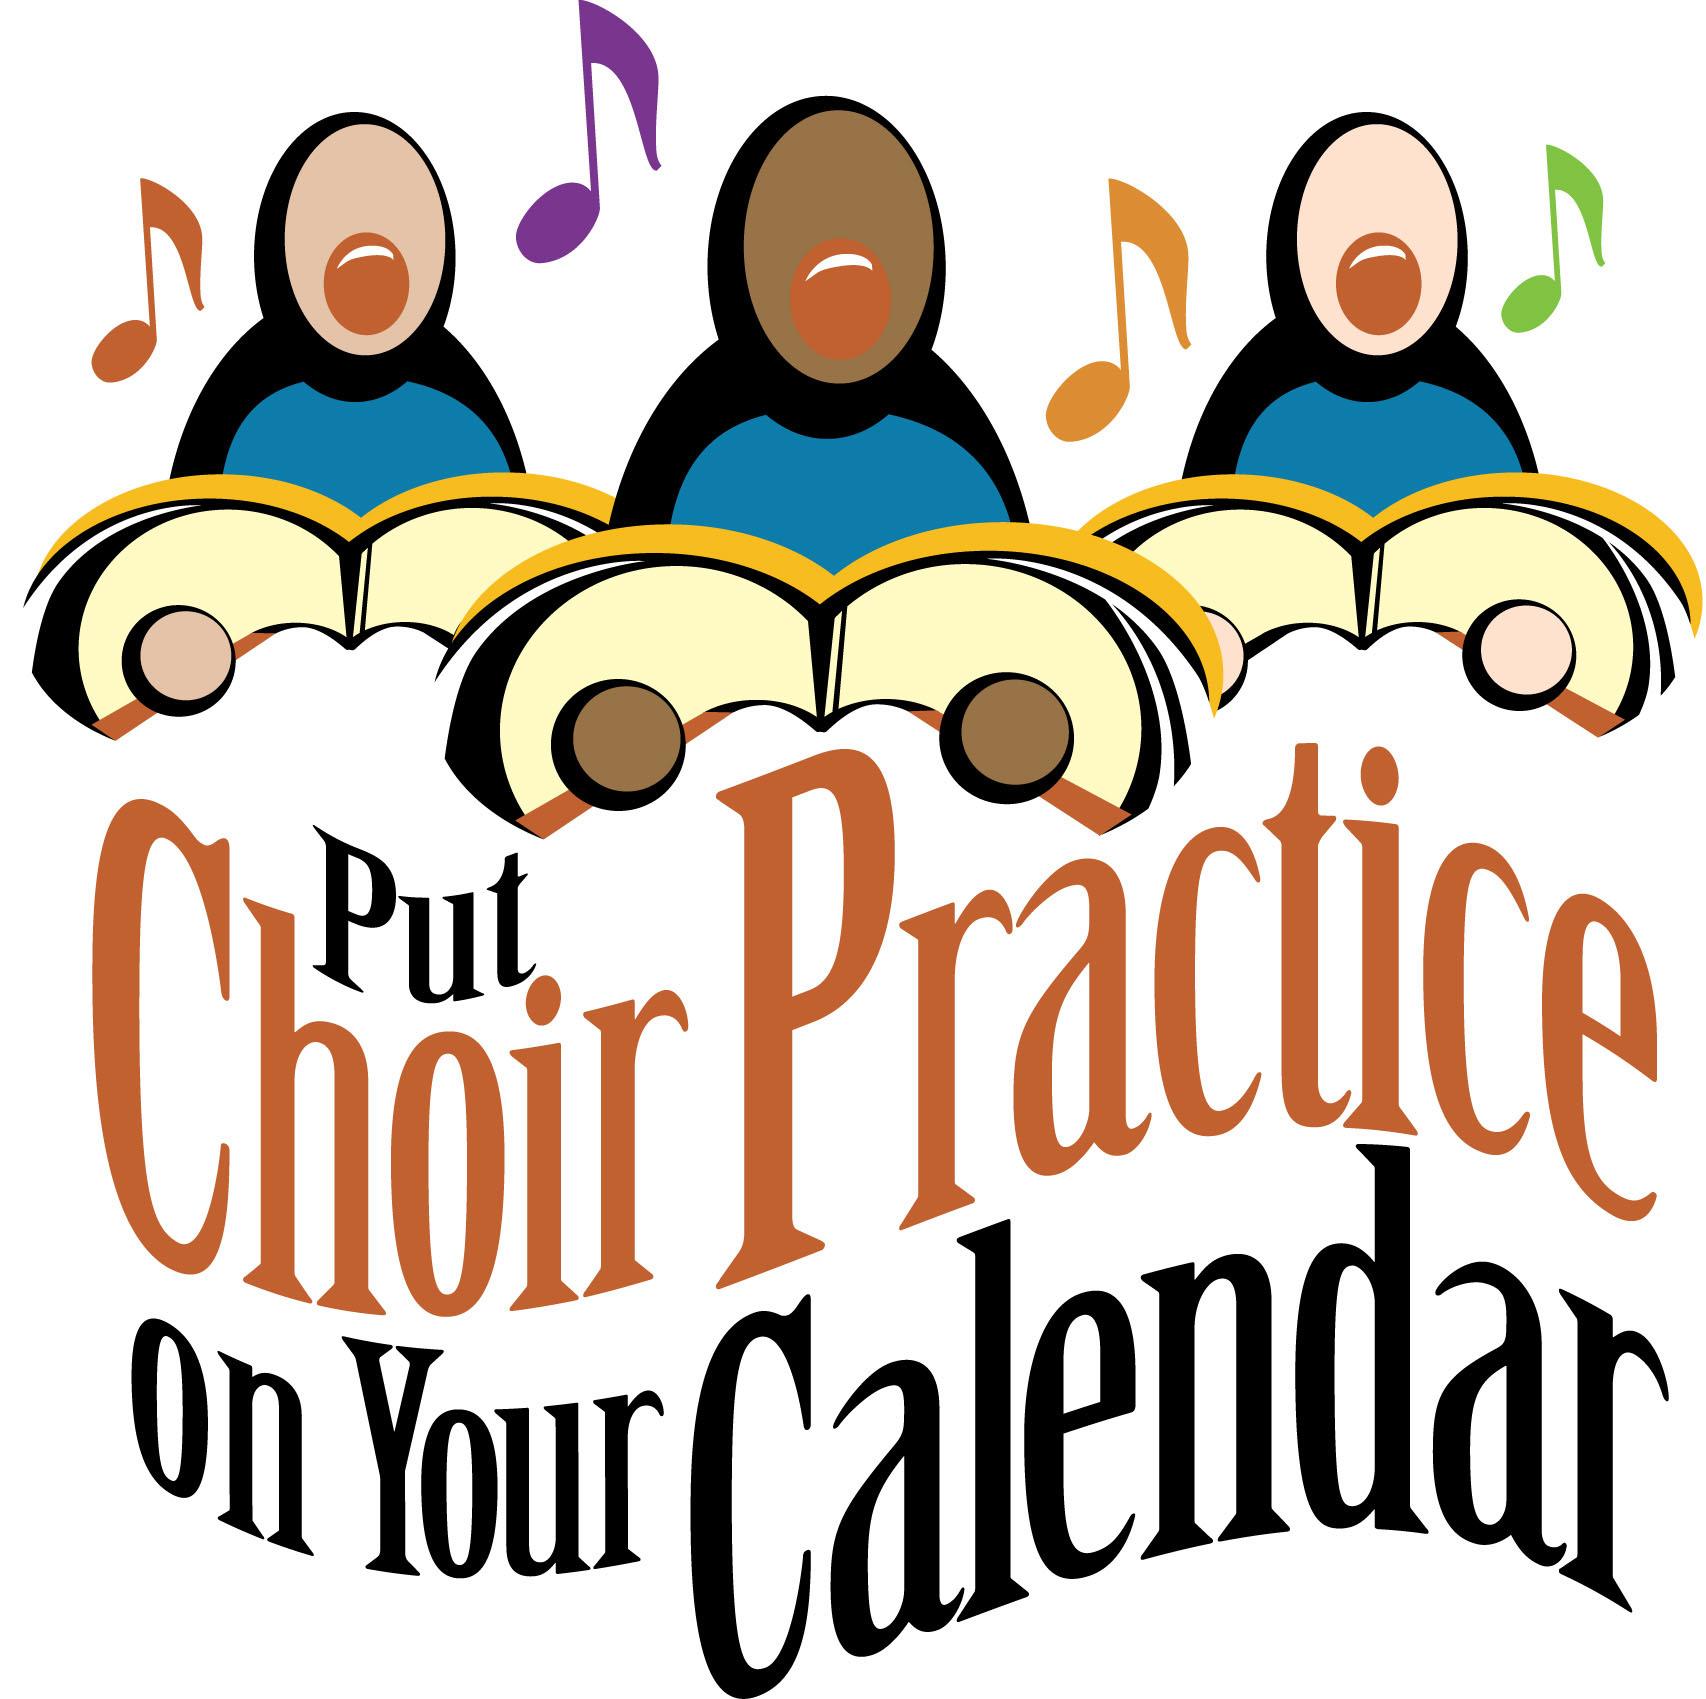 choir_practice.jpg